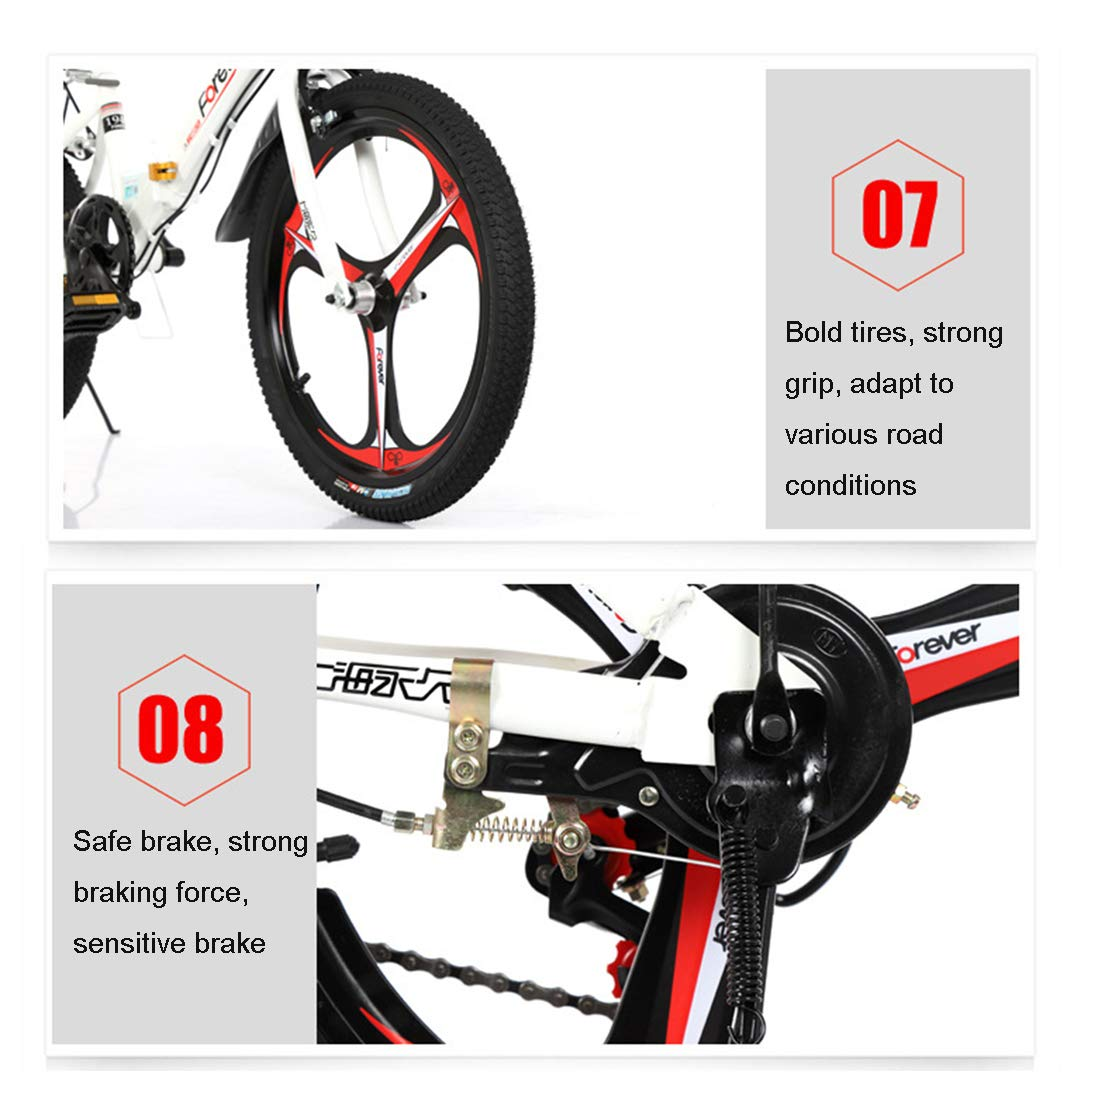 GRXXX Bicicleta para niños Plegable Bicicleta de montaña Velocidad 16/20 Pulgadas Escuela Primaria Bicicleta,White-16 Inch: Amazon.es: Hogar